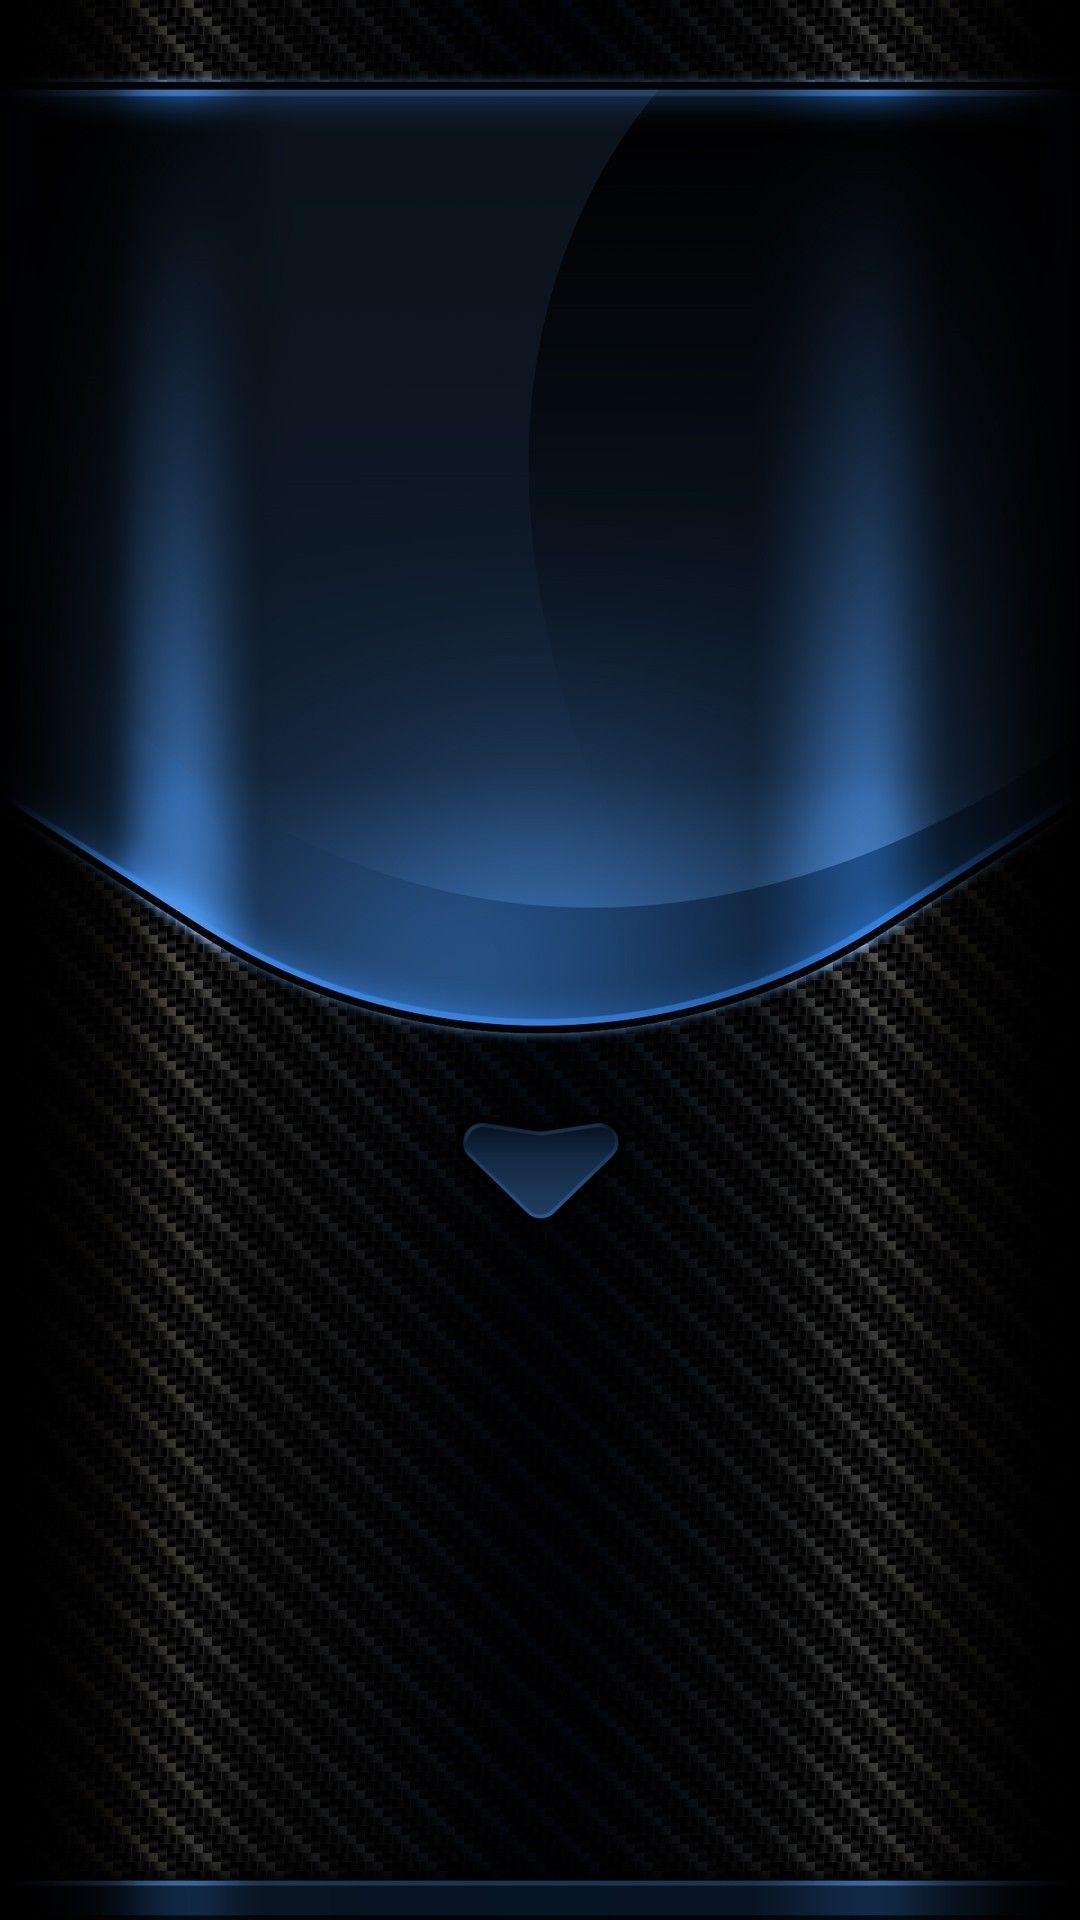 Epingle Par Blueman Group Sur Cellwallpapers Fond D Ecran Telephone Fond D Ecran Android Fond Ecran Samsung